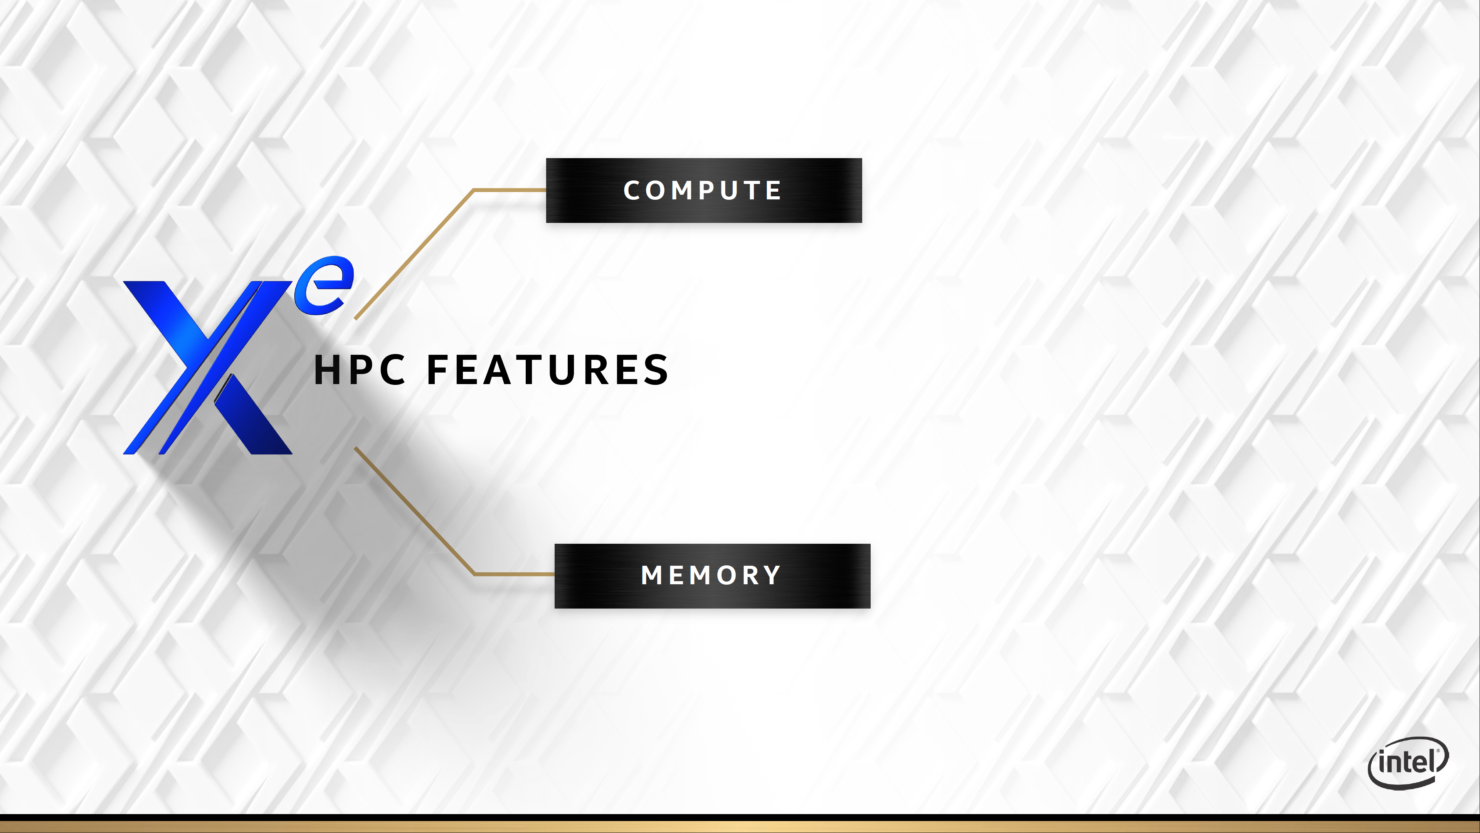 intel-xe-hpc-gpu_ponte-vecchio_architecture_raja-koduri_8